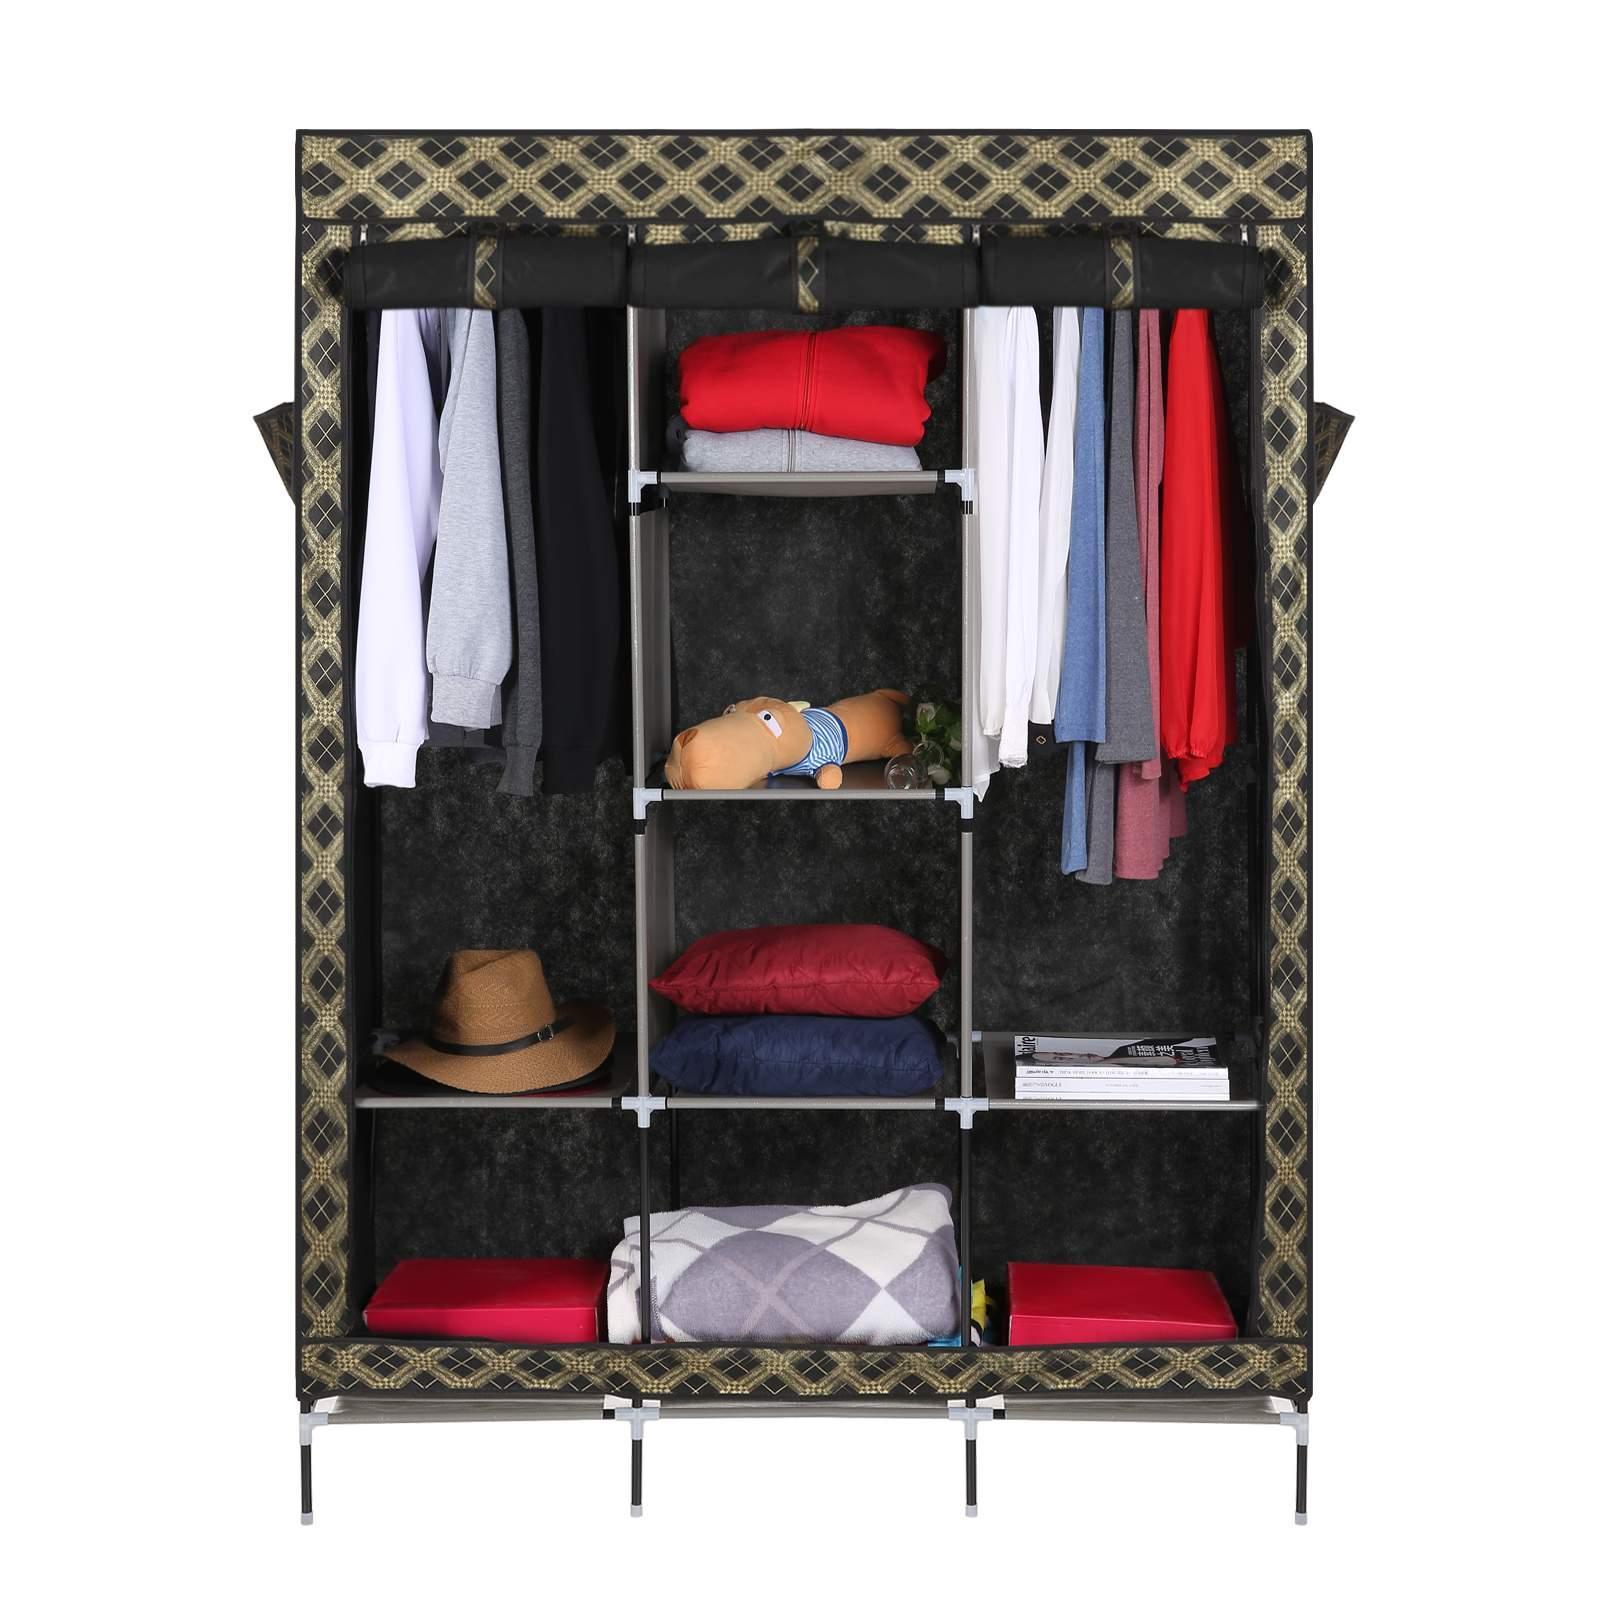 Portable Wardrobe Closets Furniture : Quot portable closet wardrobe armoire furniture